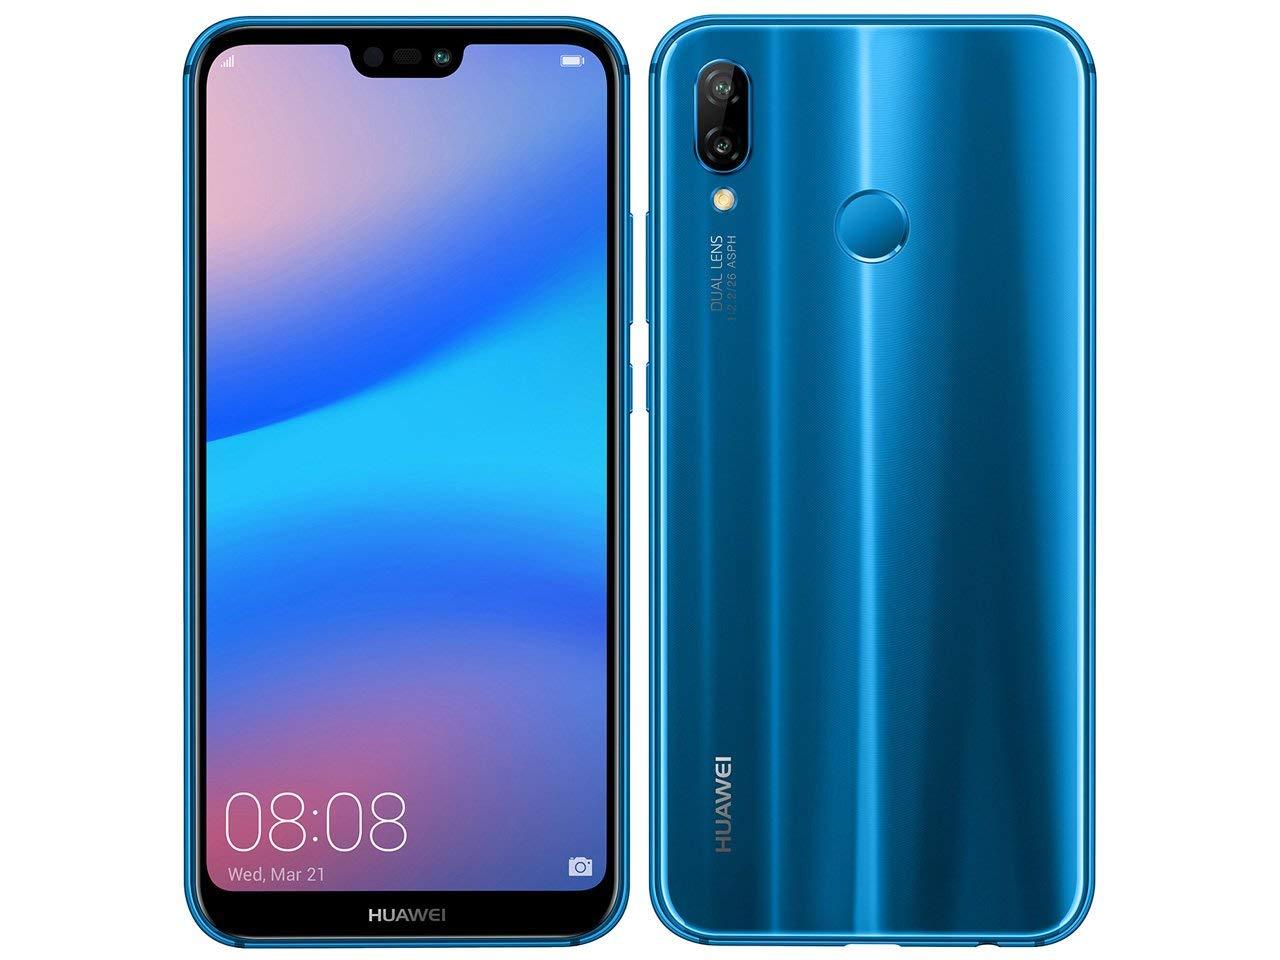 HUAWEI P20 lite SIMフリー 本体 ANE-LX2J 新品未開封 ブルー Klein Blue 32GB 4GB ショップオープン記念クーポン最大2,000円OFF使えます!